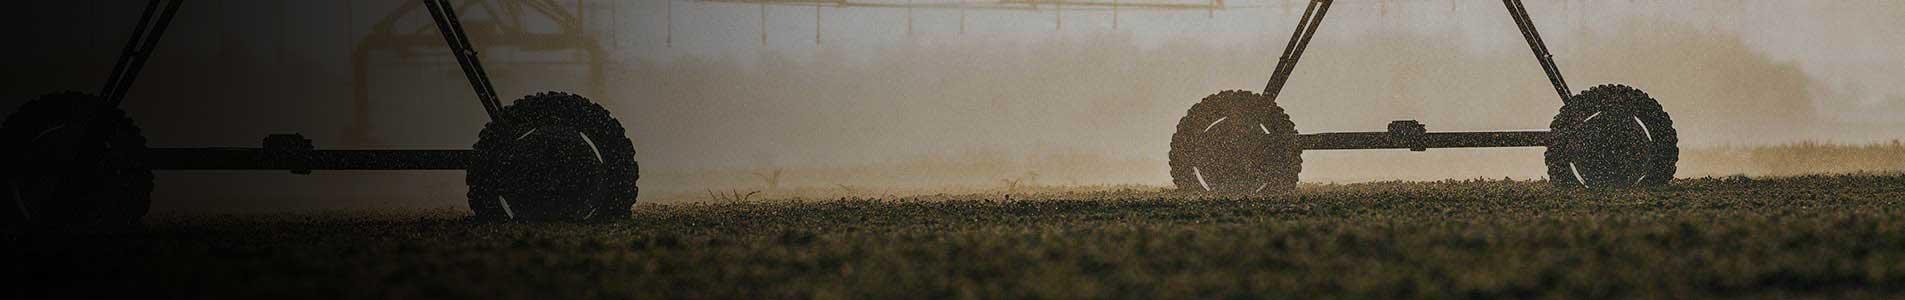 valley standard drive unit - irrigation tires